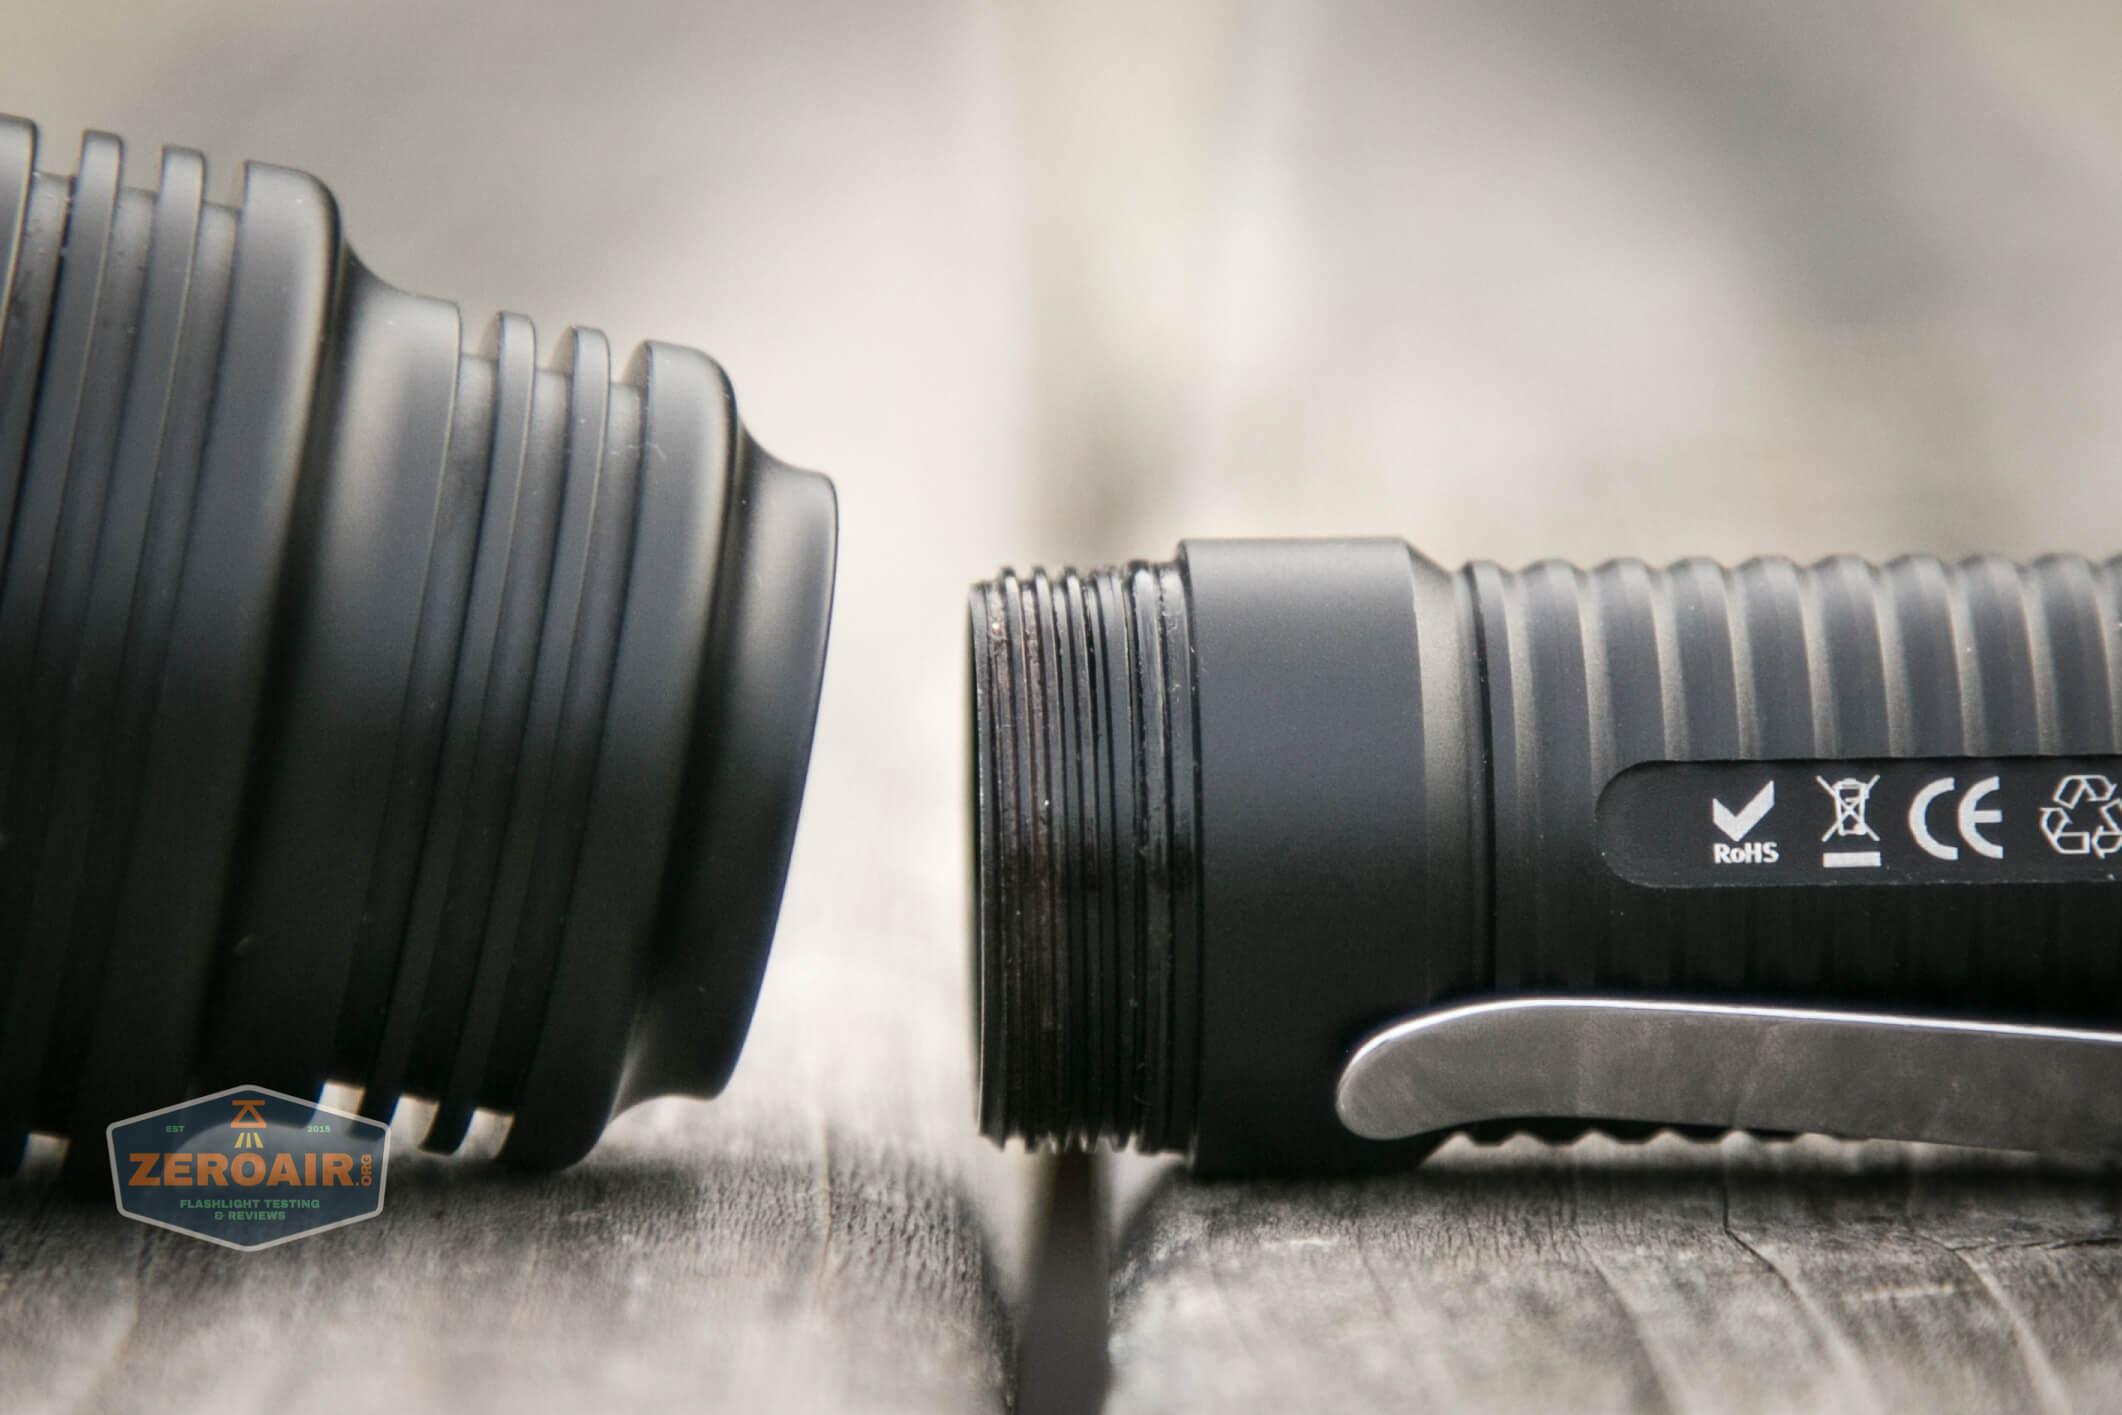 Manker MC13 thrower flashlight 18650 threads